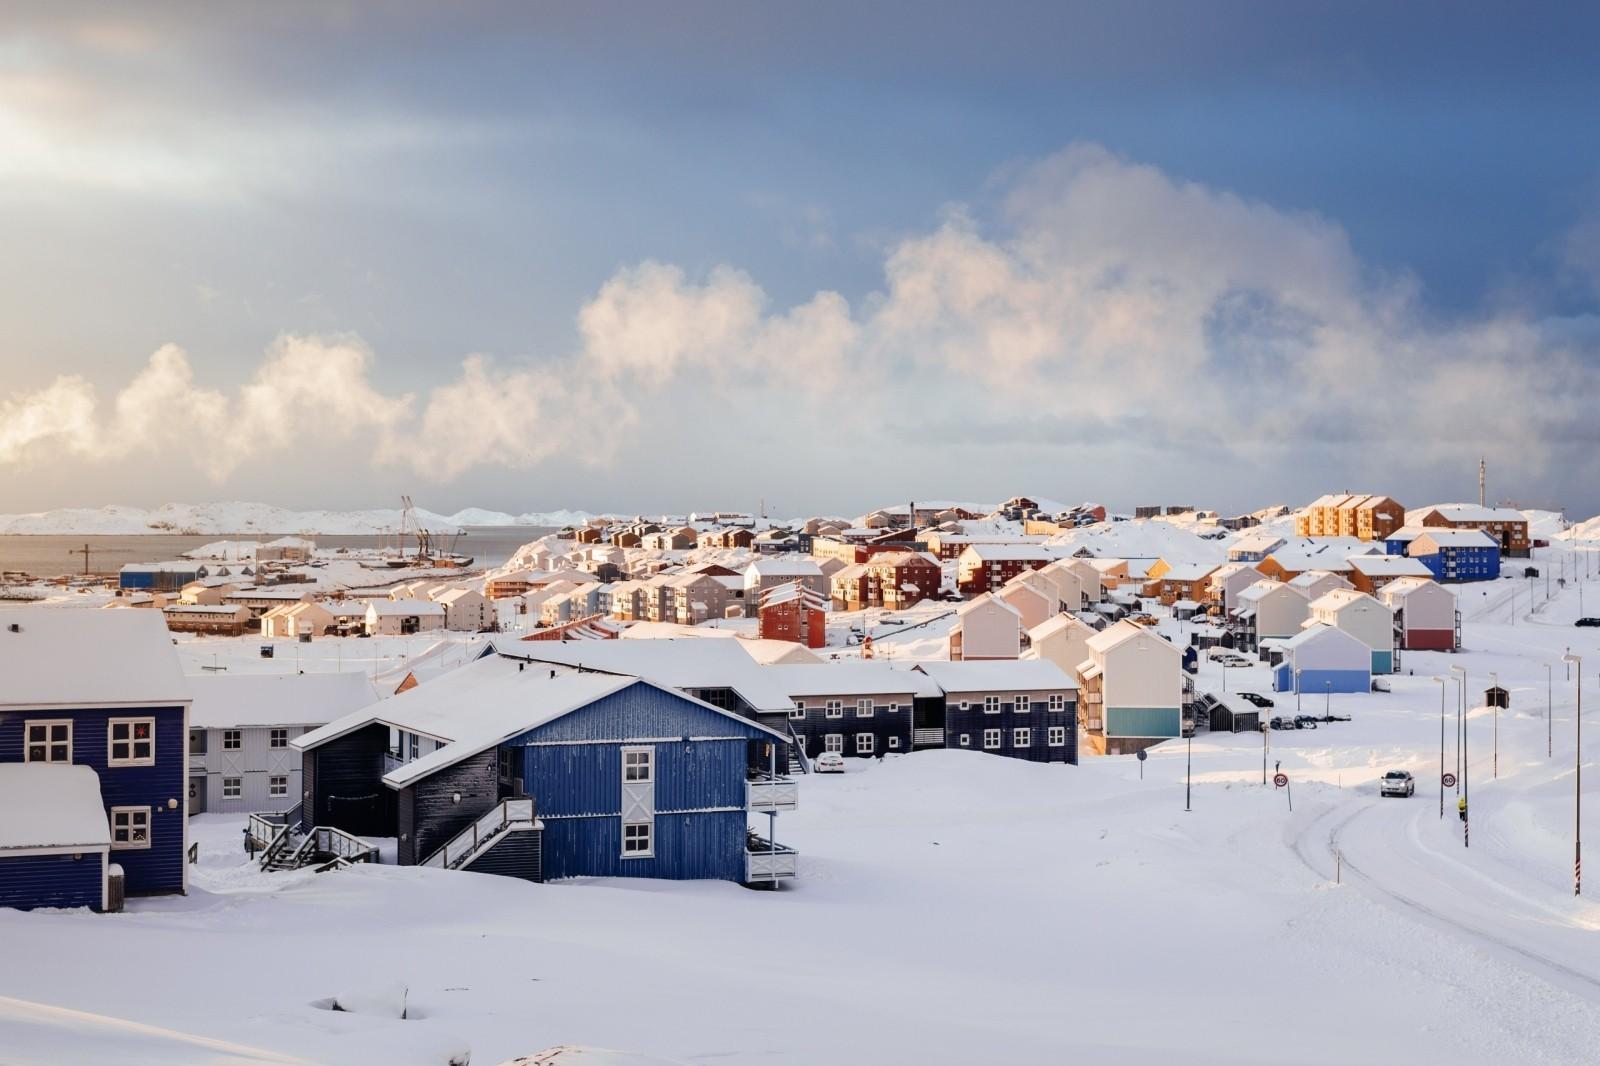 Before-Sunrise over Nussuaq in Nuuk